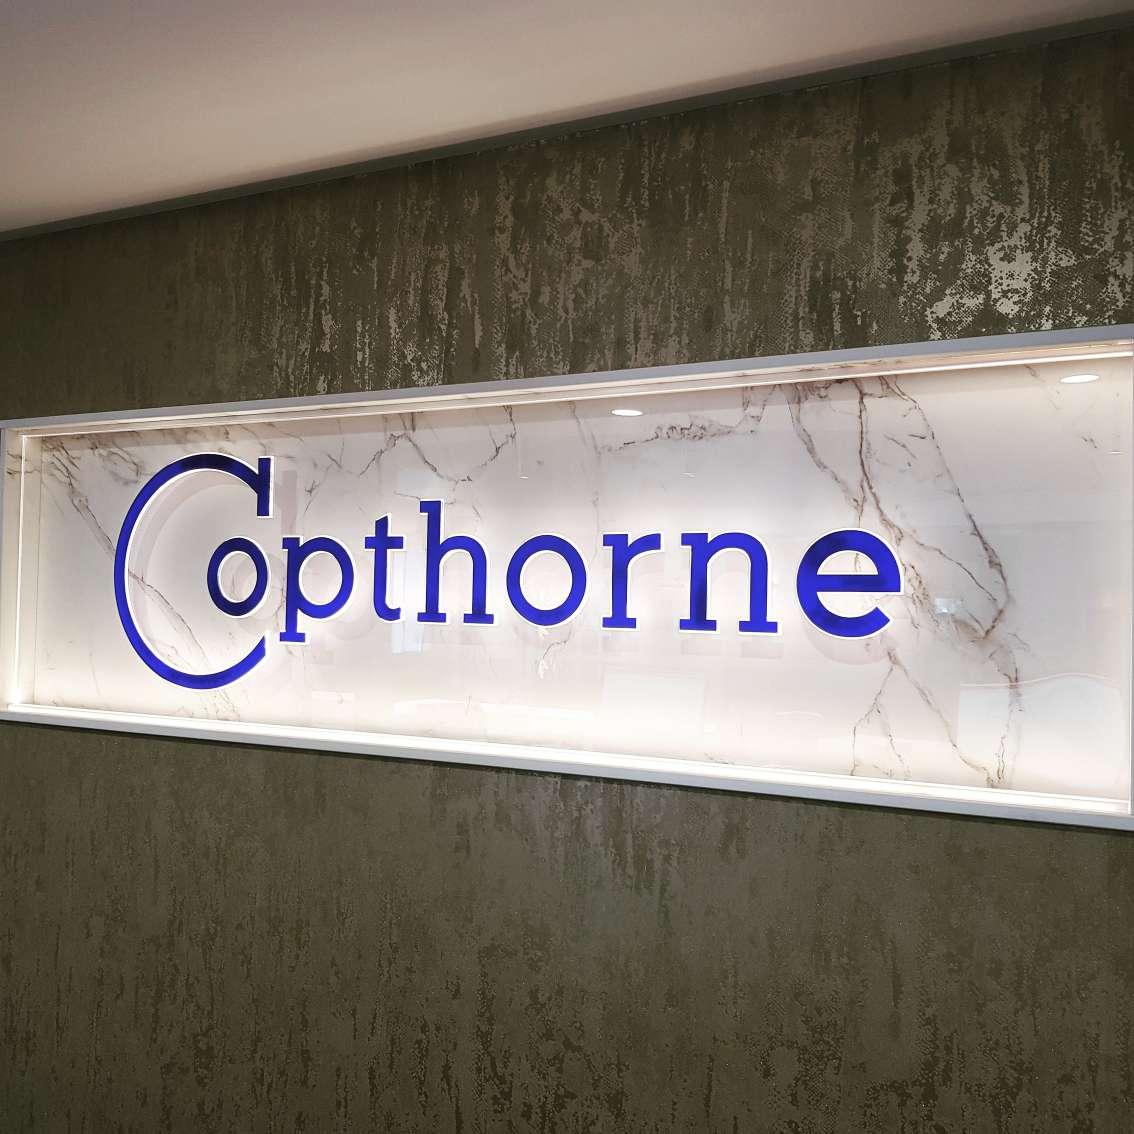 Copthorne Solway Masterton